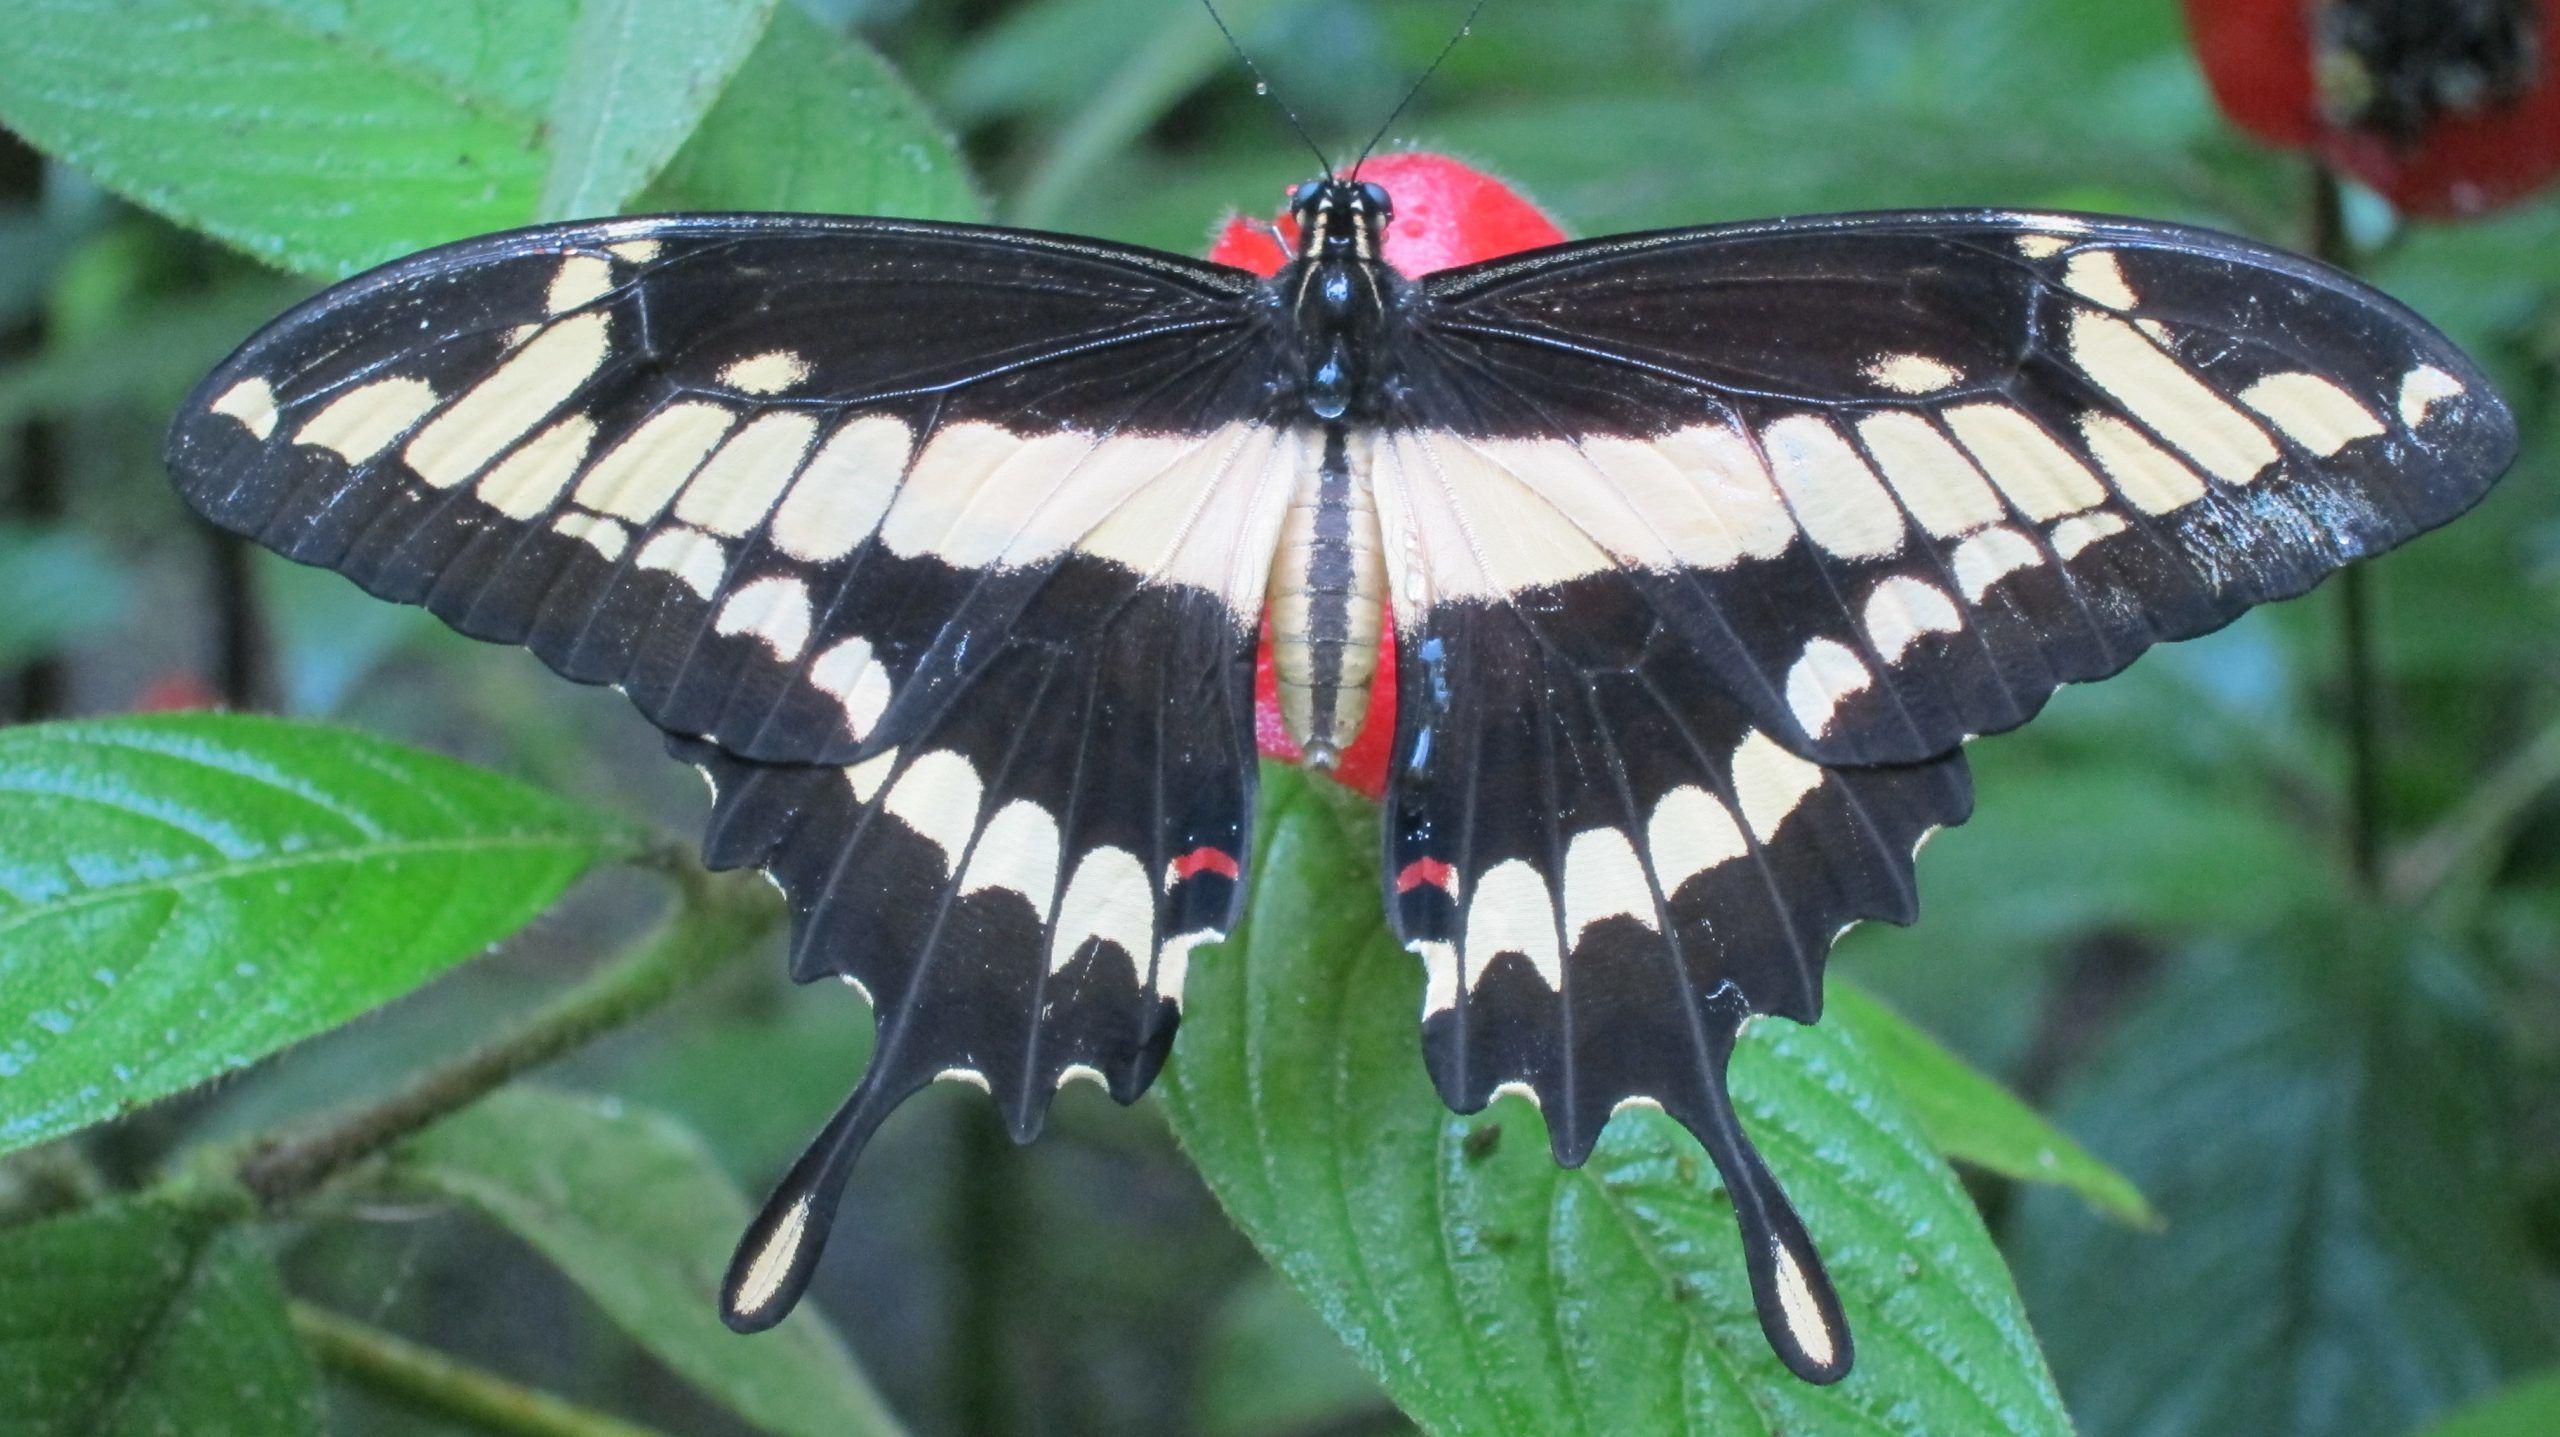 Playa Tortuga Butterfly Garden Volunteering Project, Costa Rica